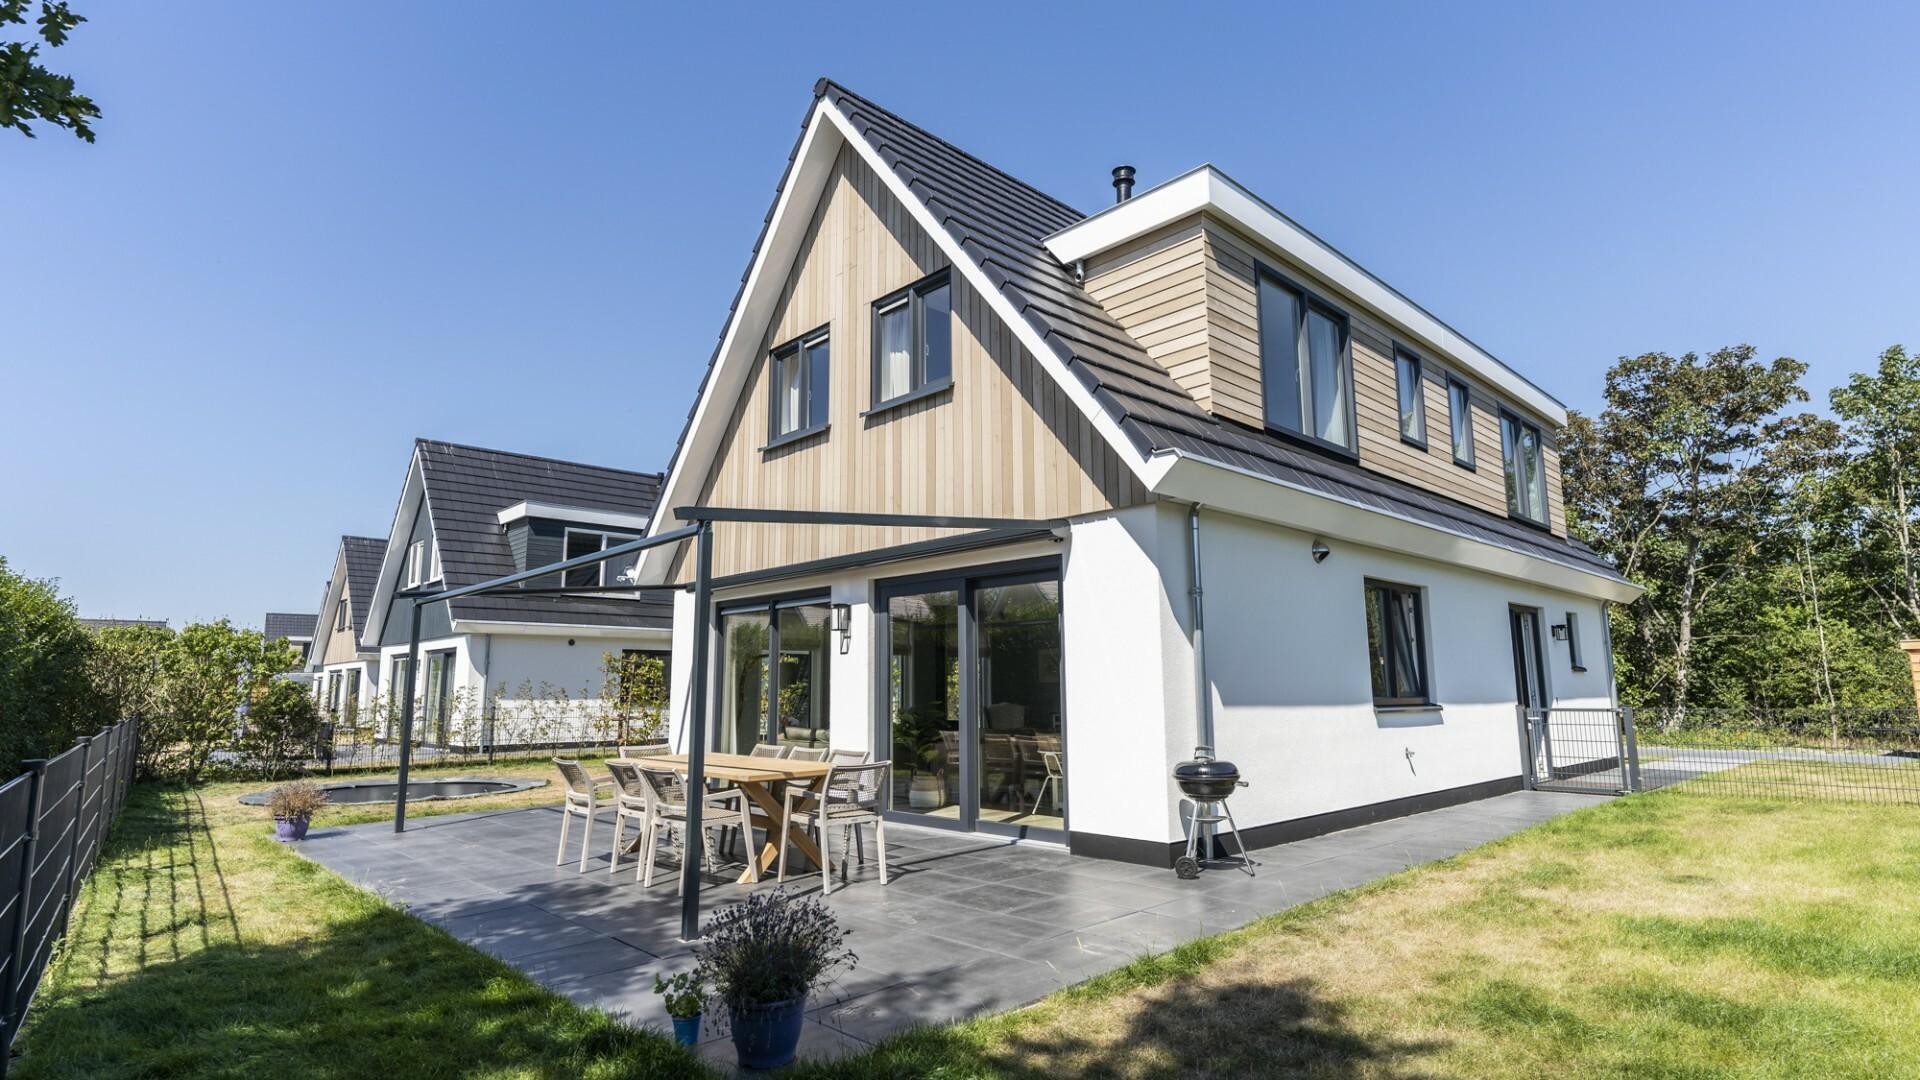 Vakantiewoning tuin villapark So What VVV Texel